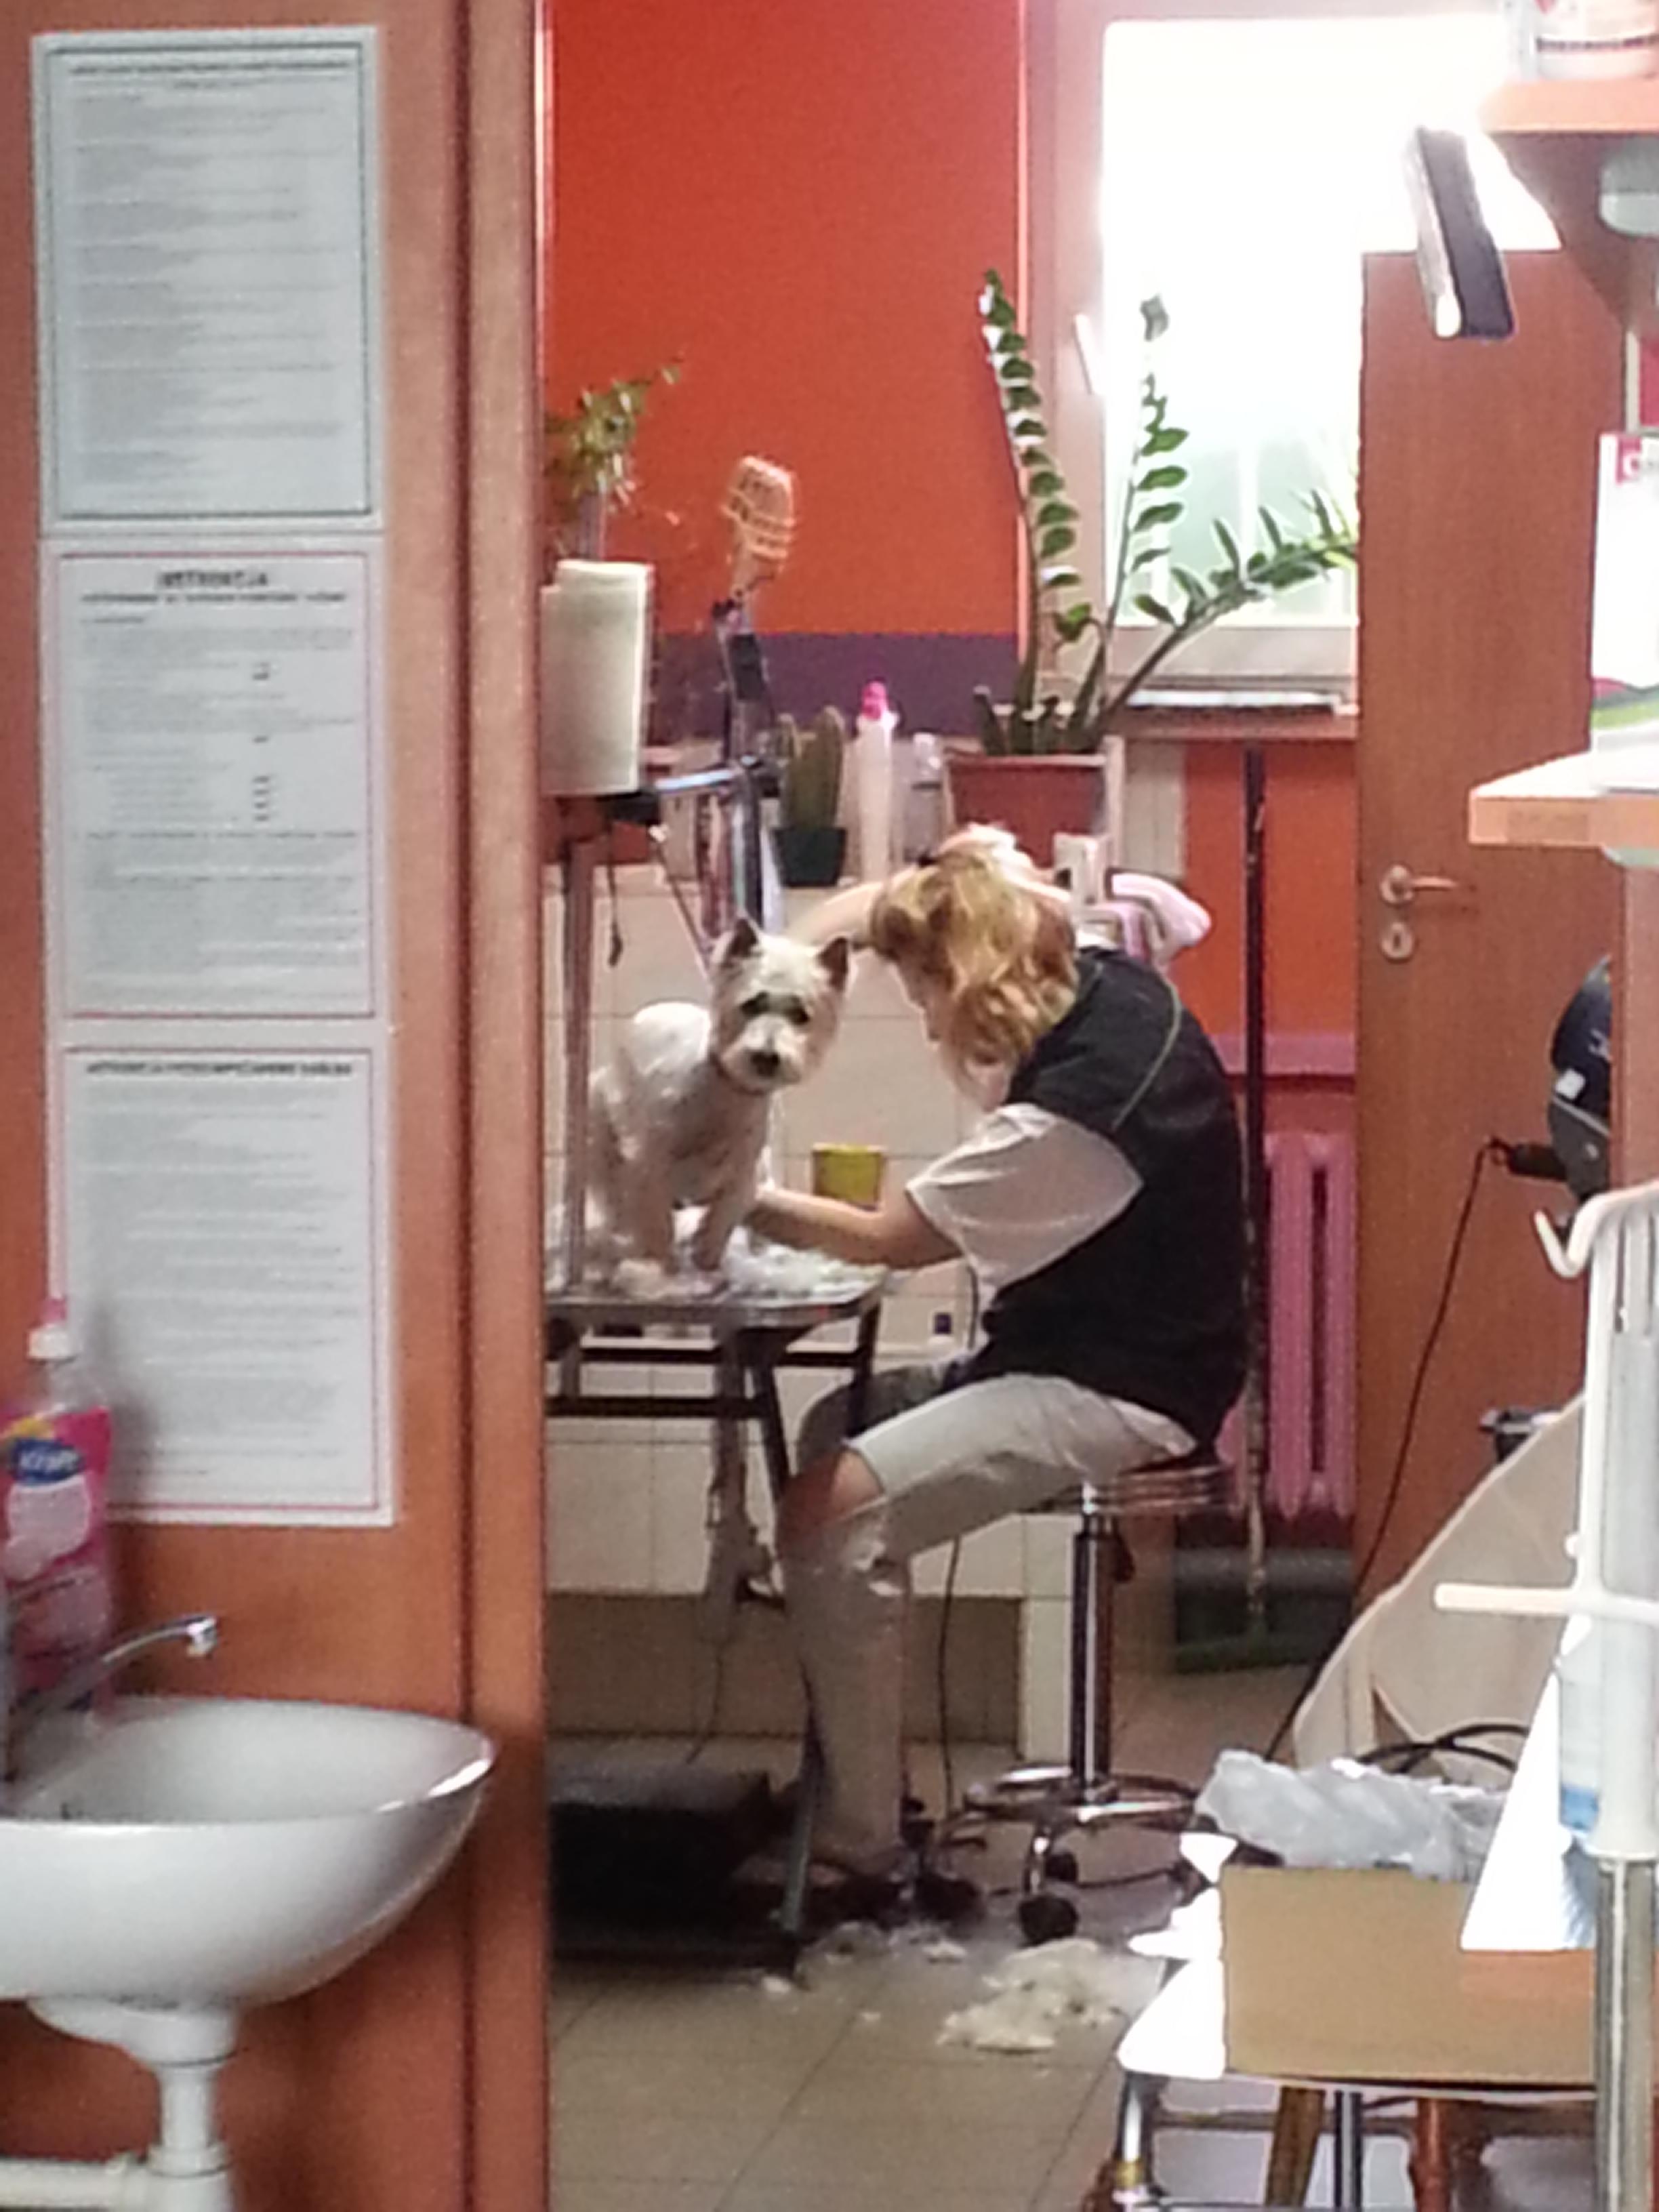 fifa fryzjer